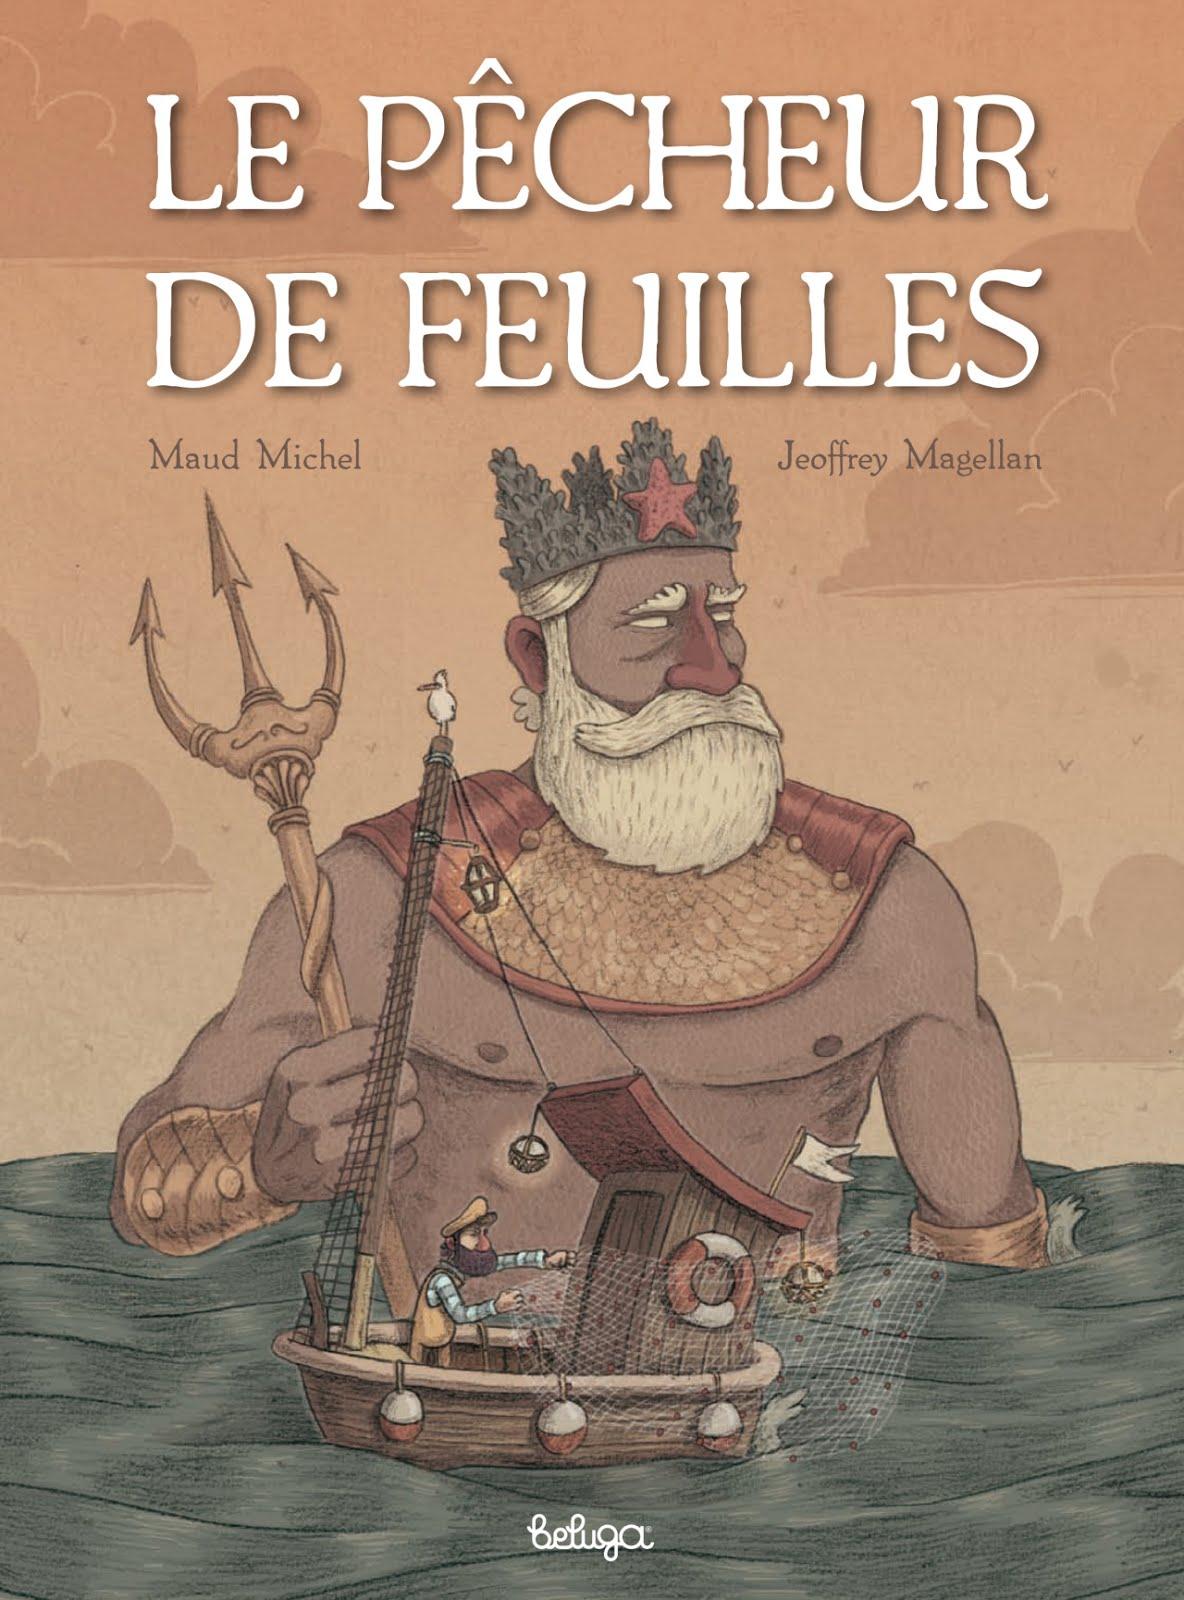 jeoffrey Magellan